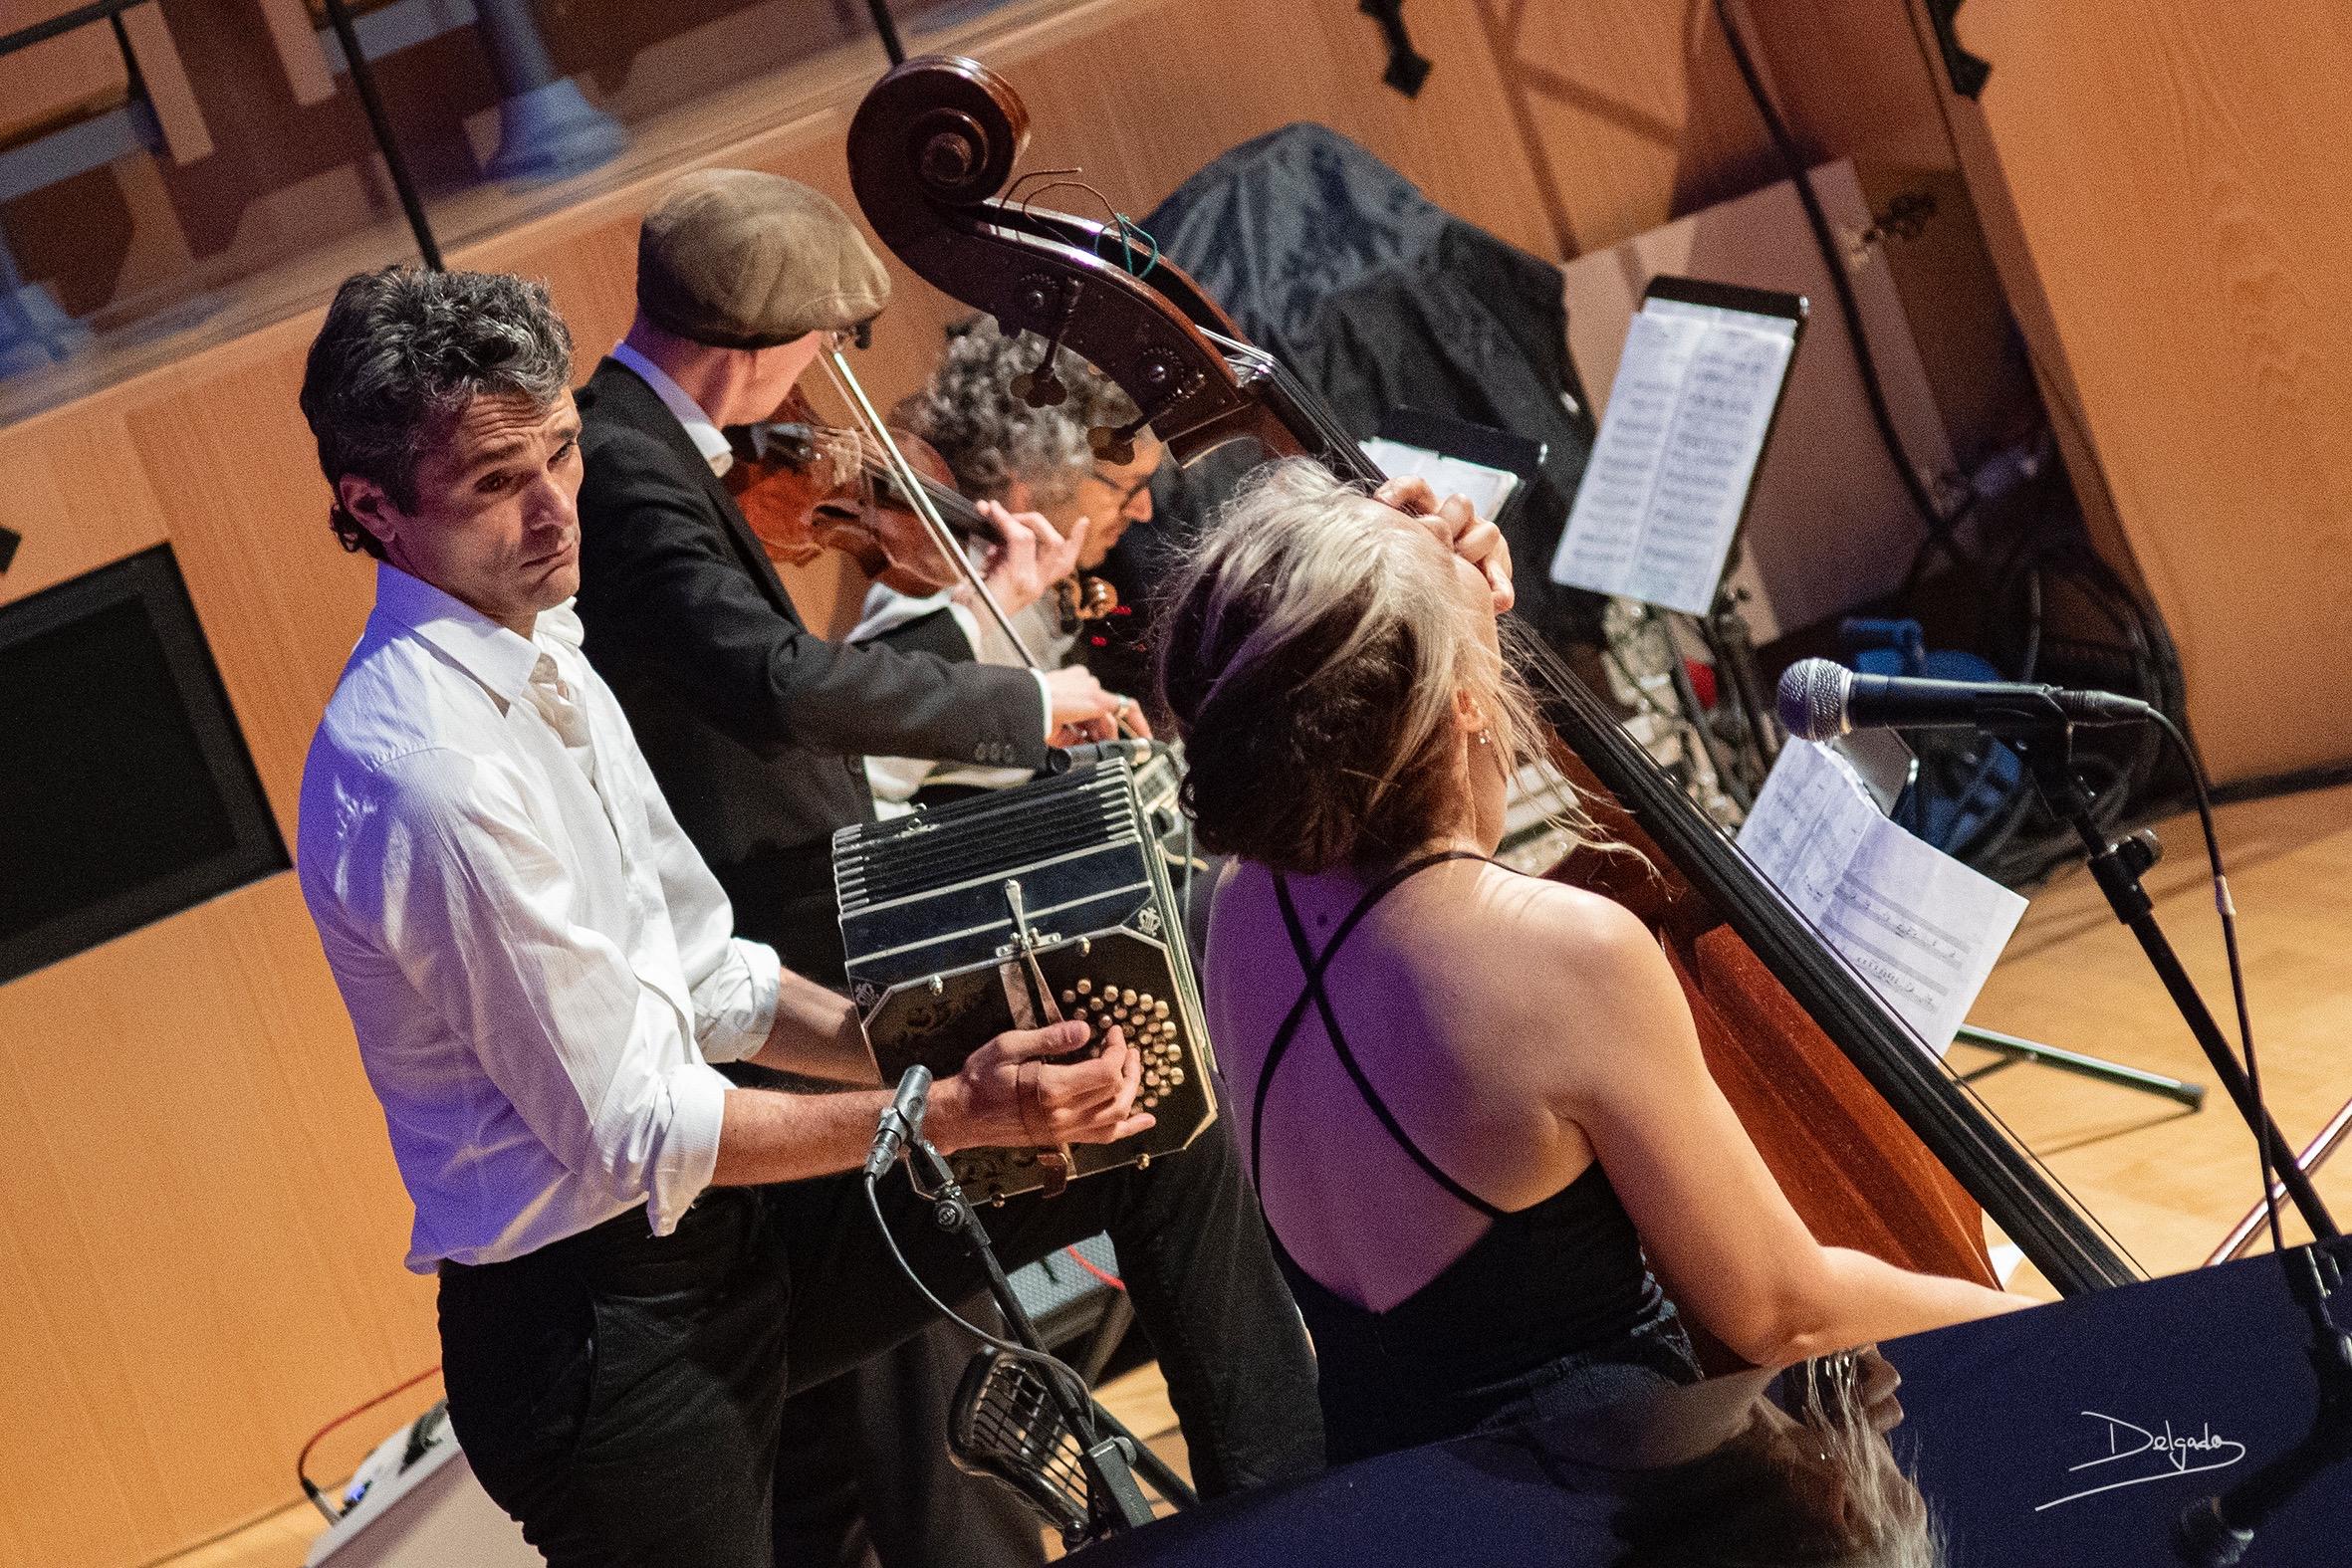 Momentos del homenaje a Piazzolla del Quinteto Astor